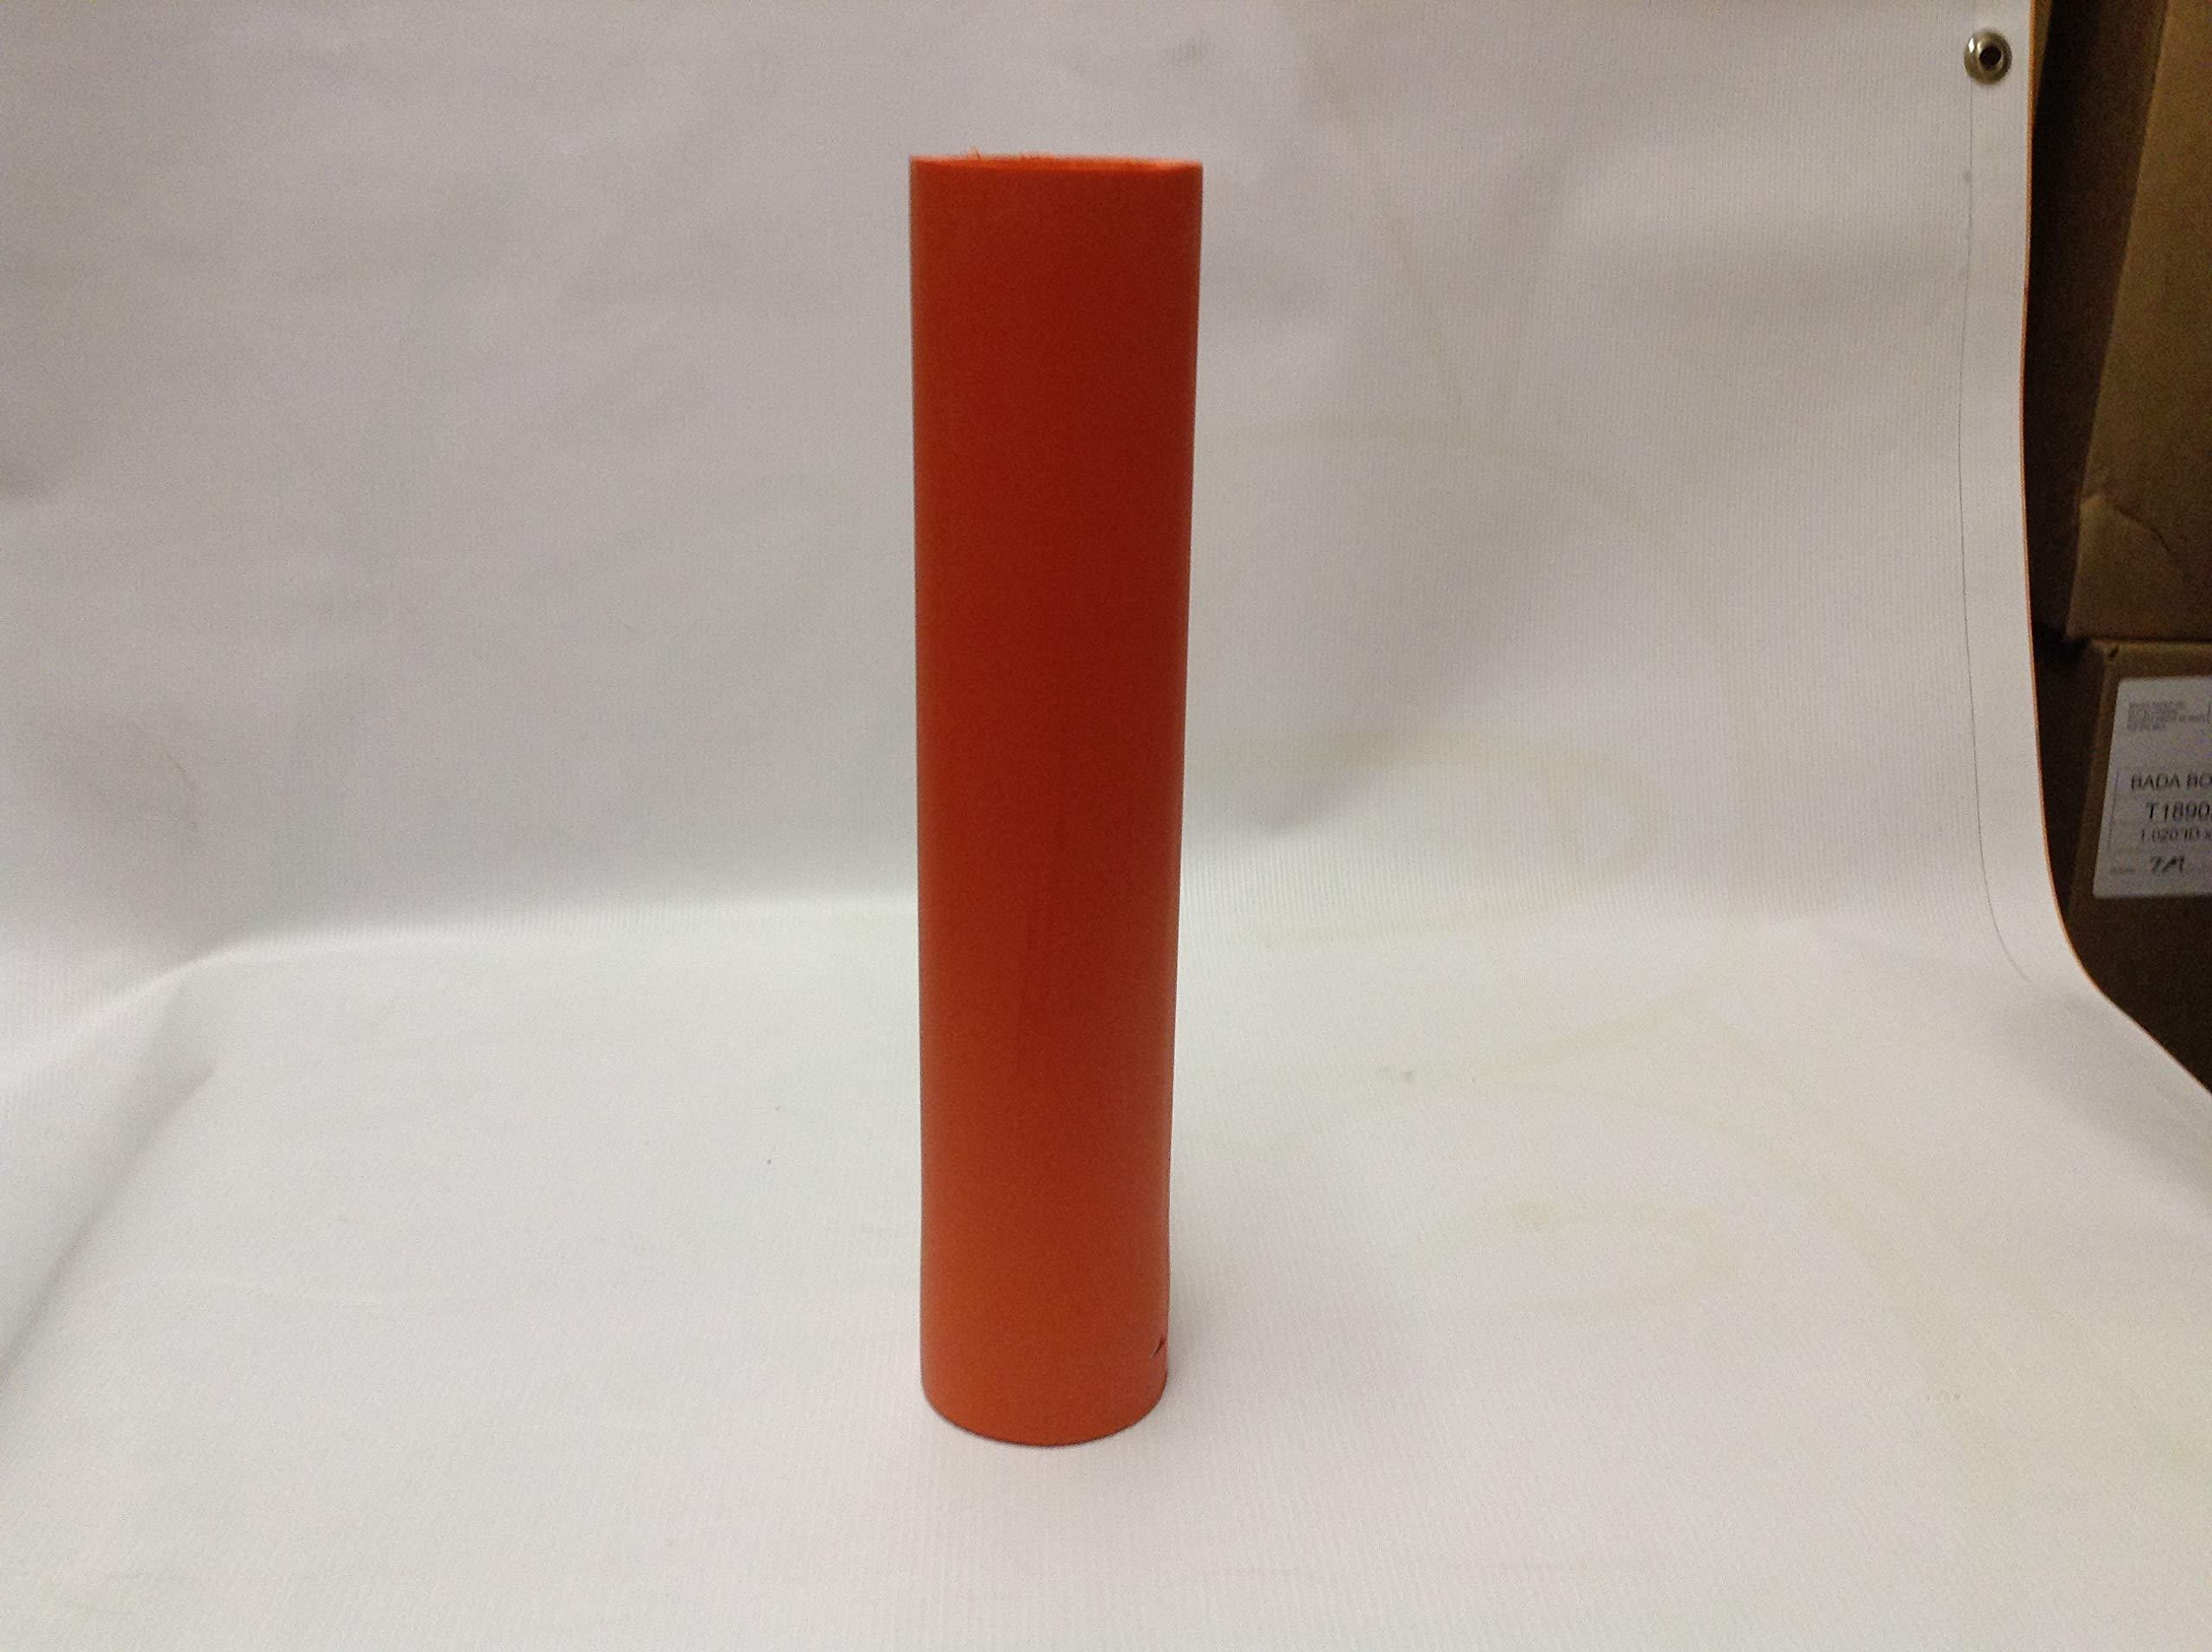 Mortar Tube Fireworks Orange HDPE DR 11 10PCS